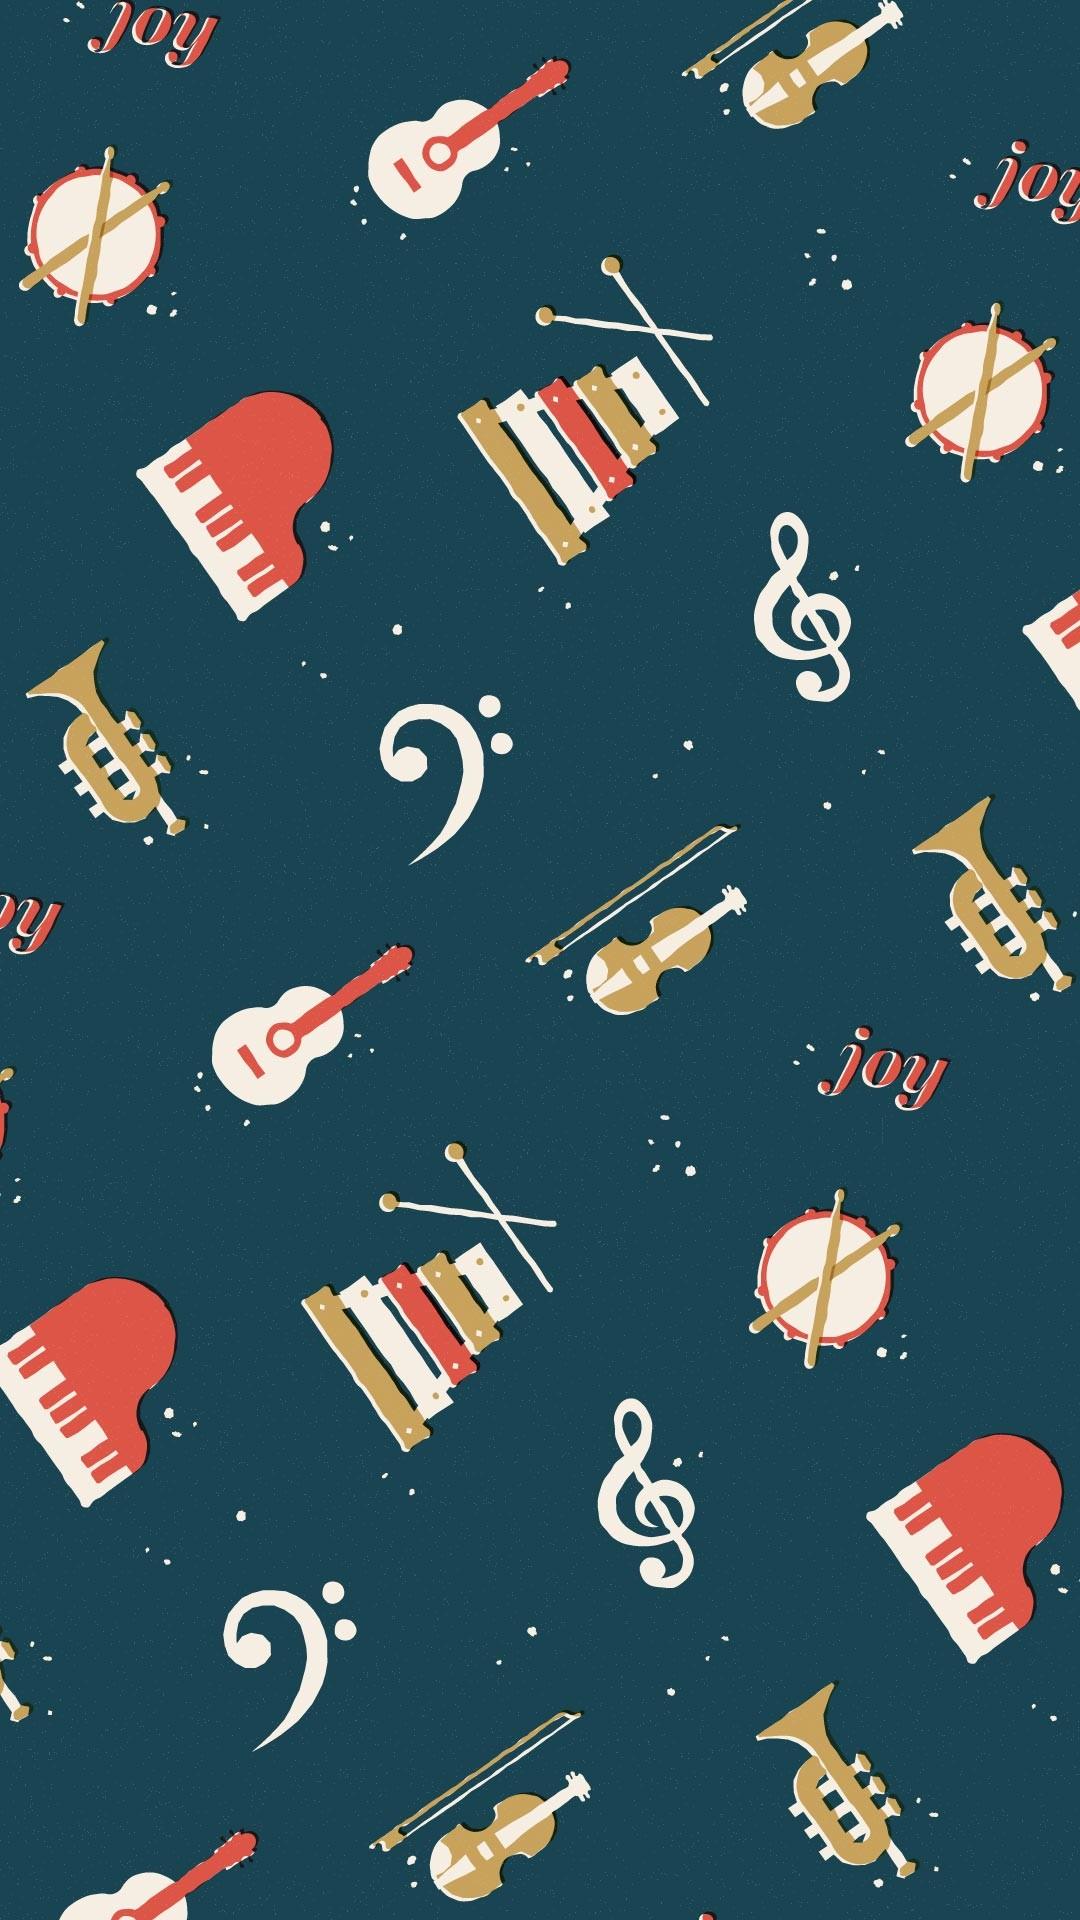 Res: 1080x1920, Holiday Phone Wallpaper